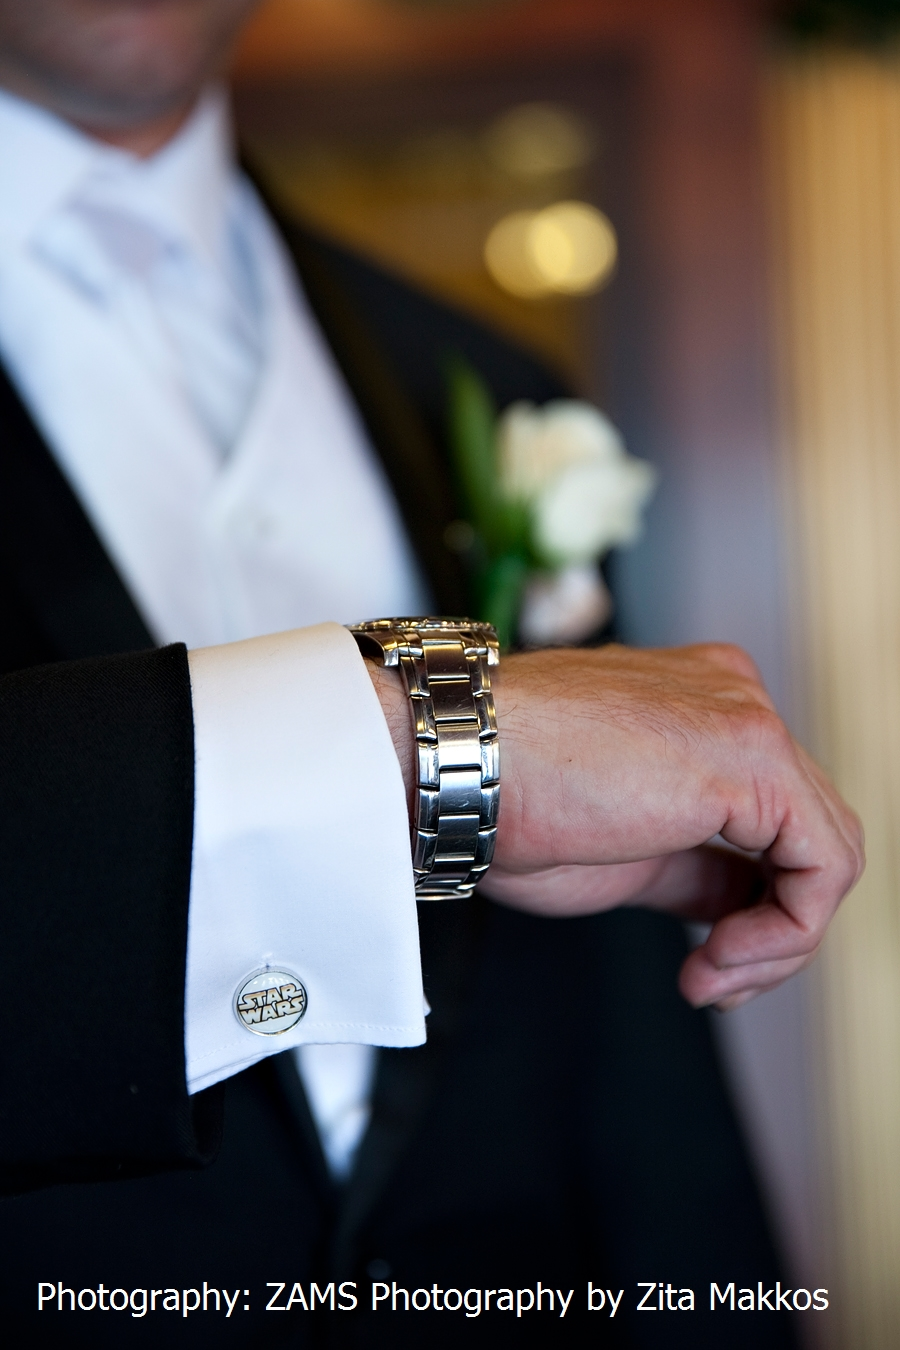 finland_flags_world_collection_cuff_links_men_weddings_groomsmen_grooms_dads_gifts_cufflinks_2.jpg